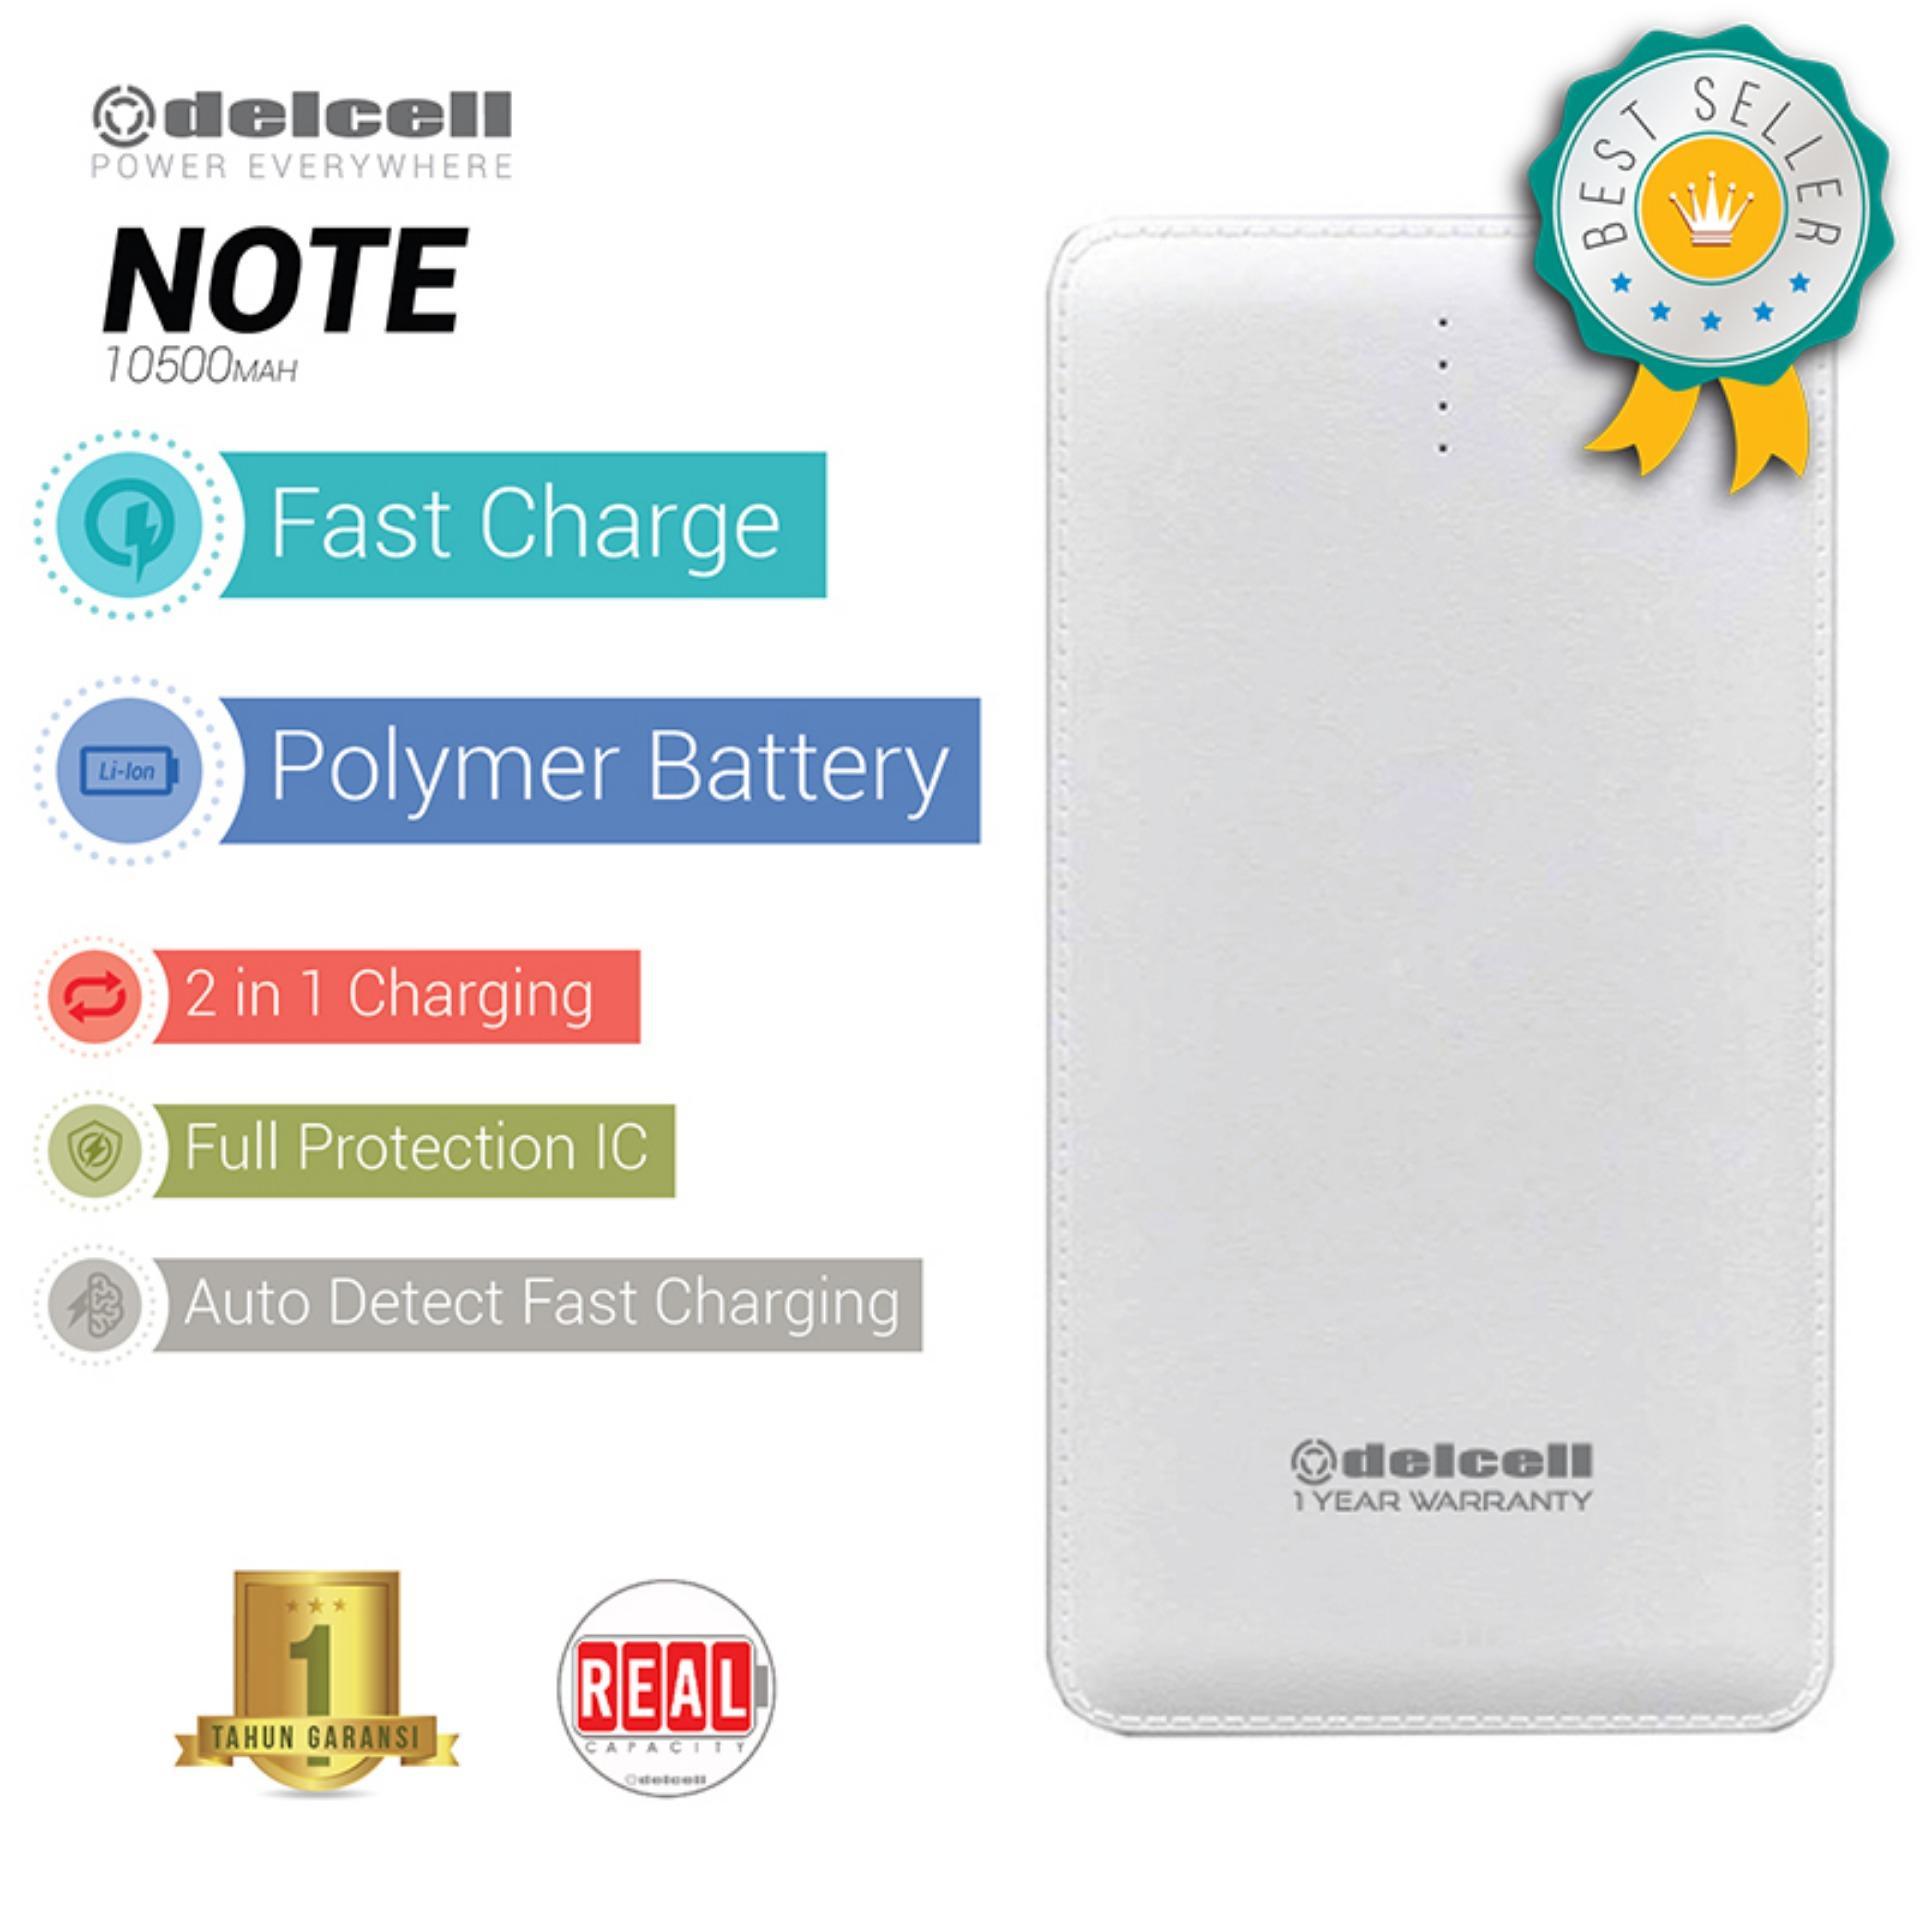 Delcell NOTE Powerbank 10500mAh Real Capacity Fast Charging Polymer Battery - Putih